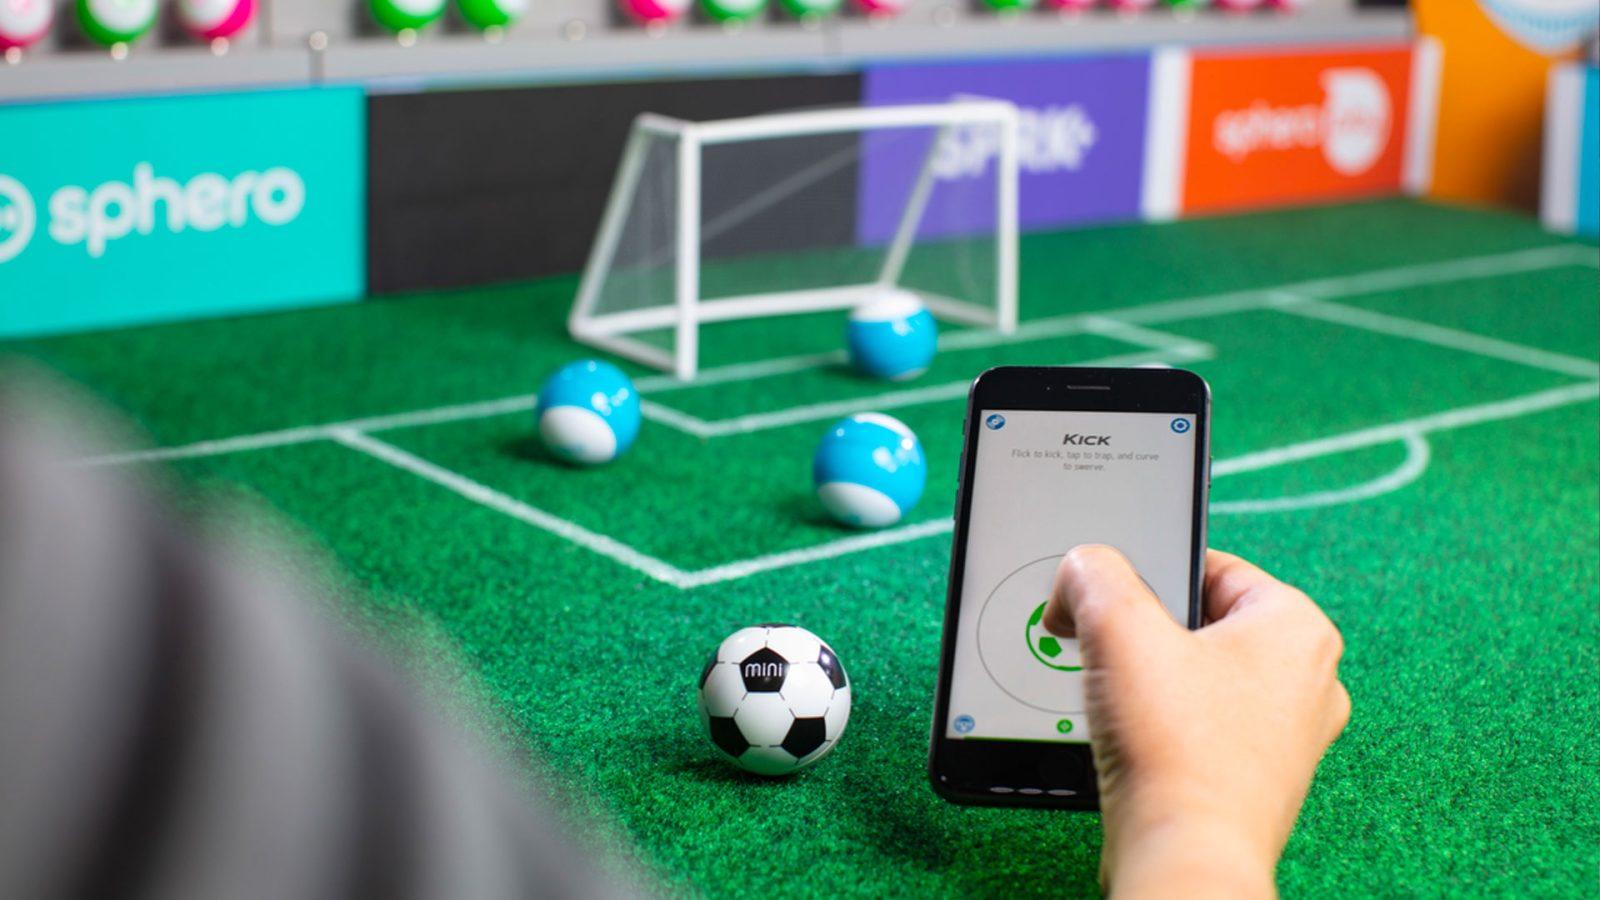 Sphero's Mini Activity + Mini Soccer kits bring learning to the living room